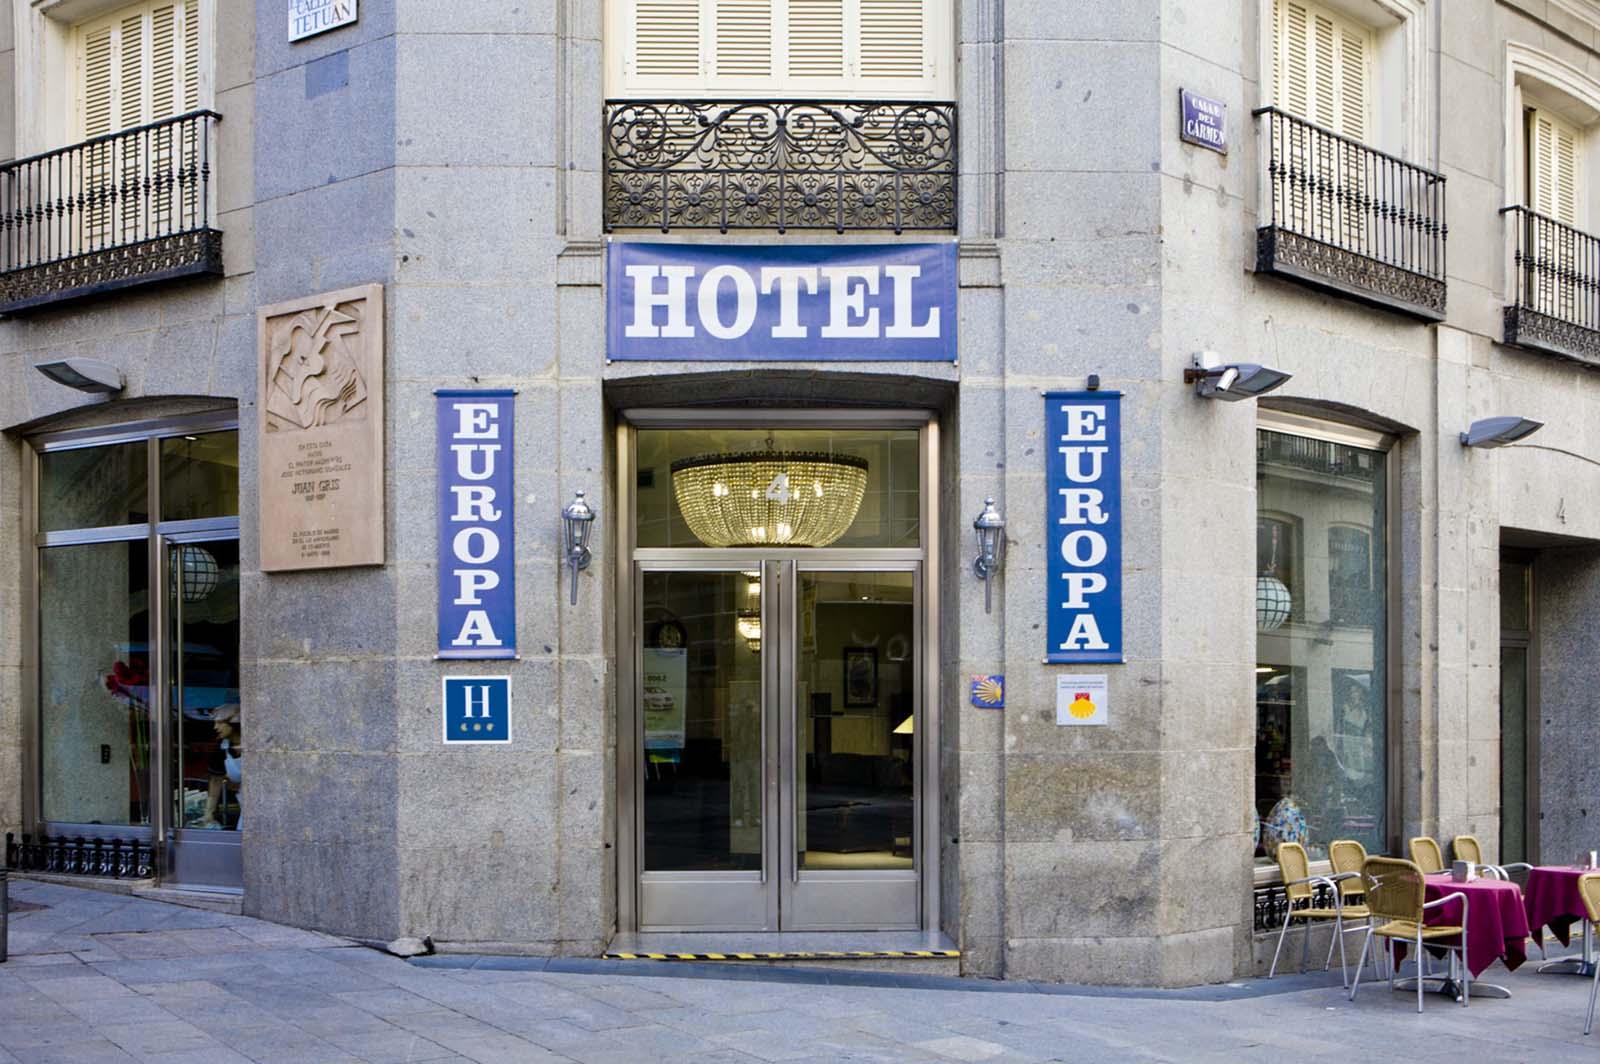 Fotos del hotel europa puerta del sol madrid for Hotel madrid sol